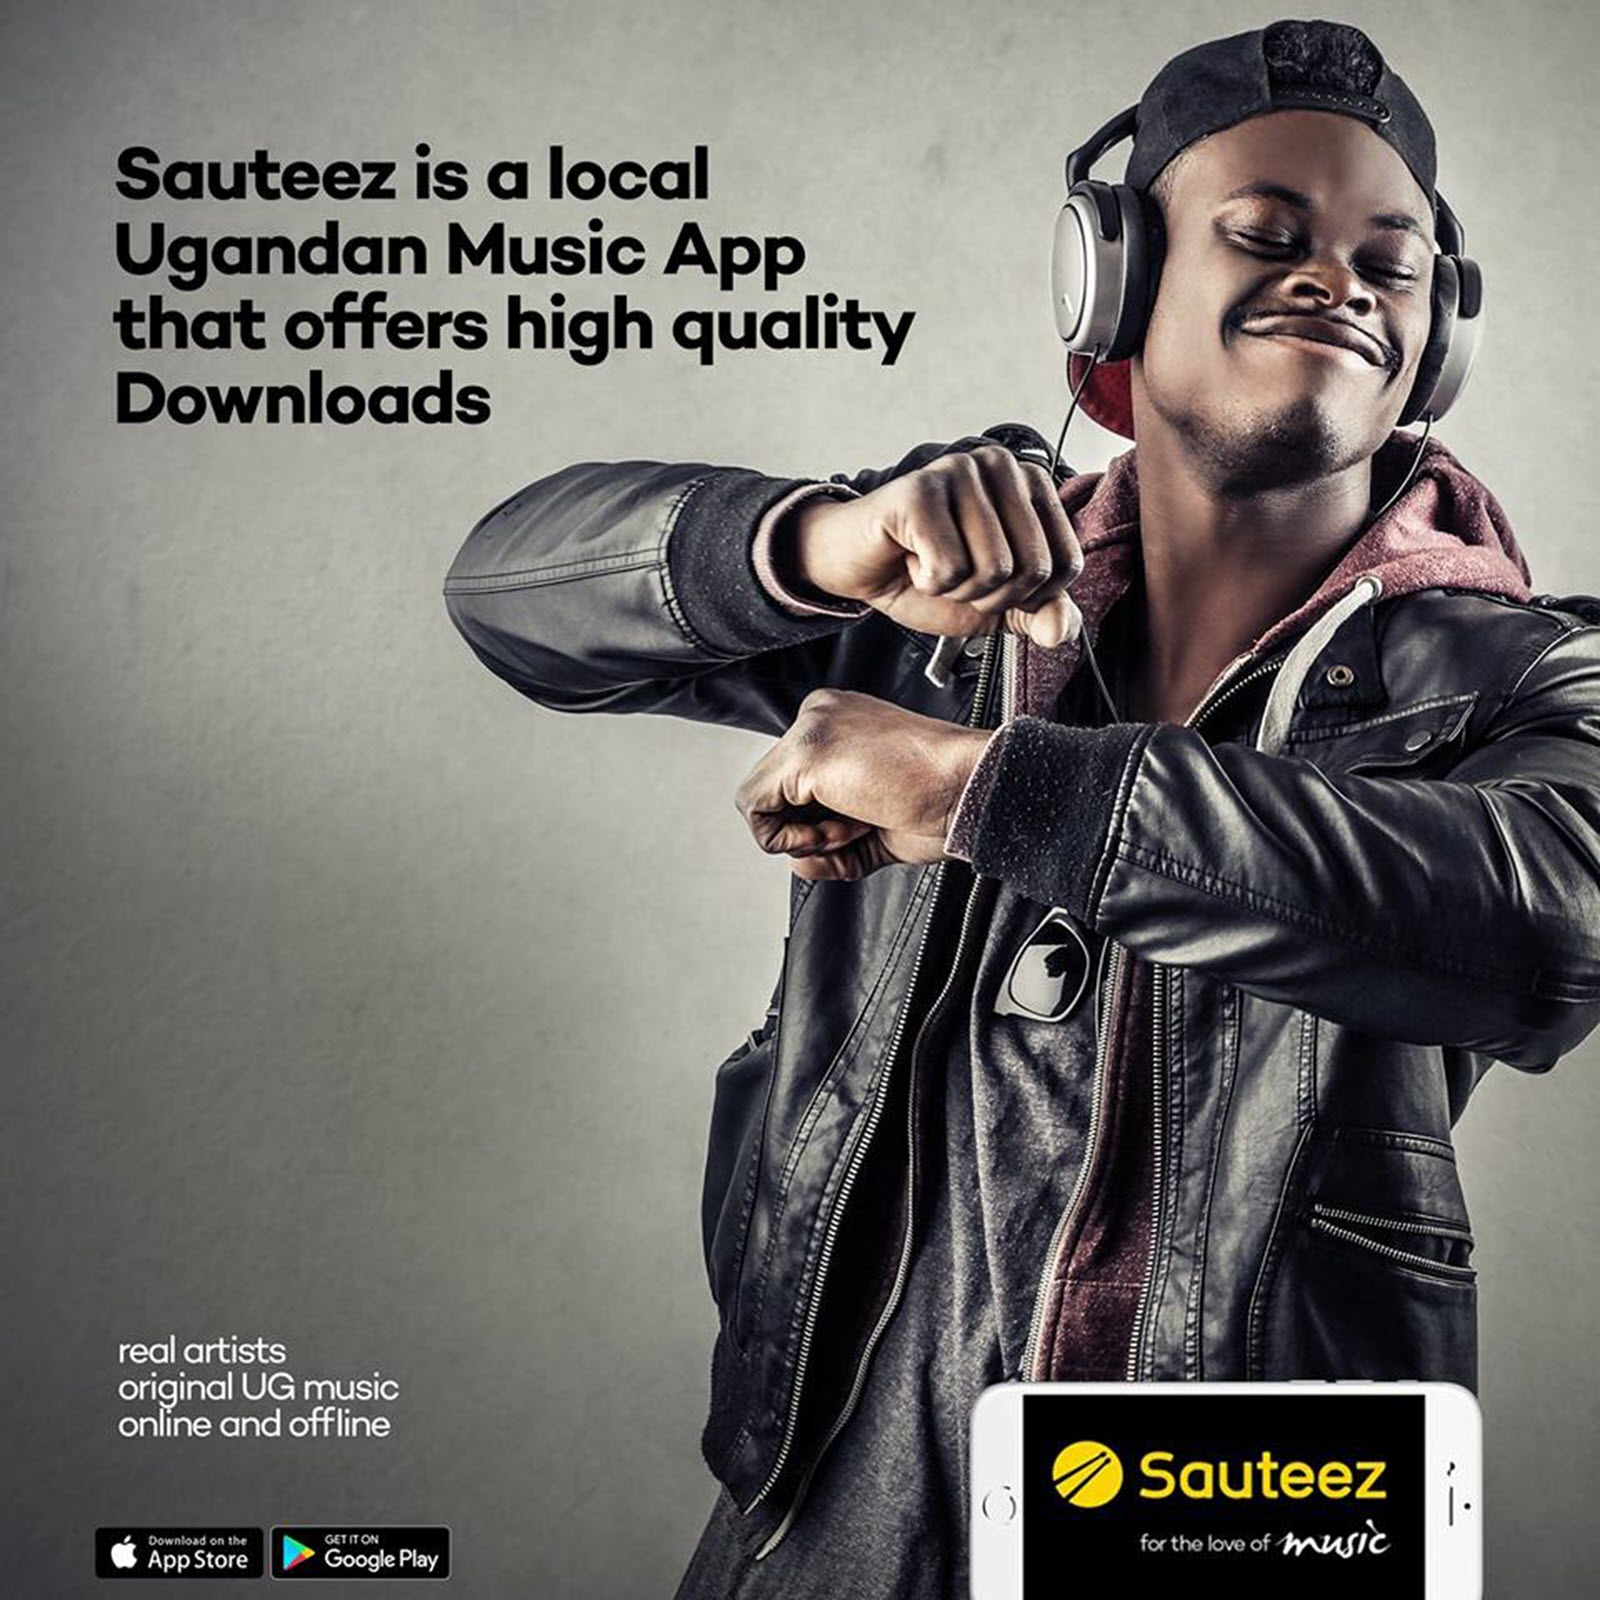 New Ugandan music streaming app Sauteez launched